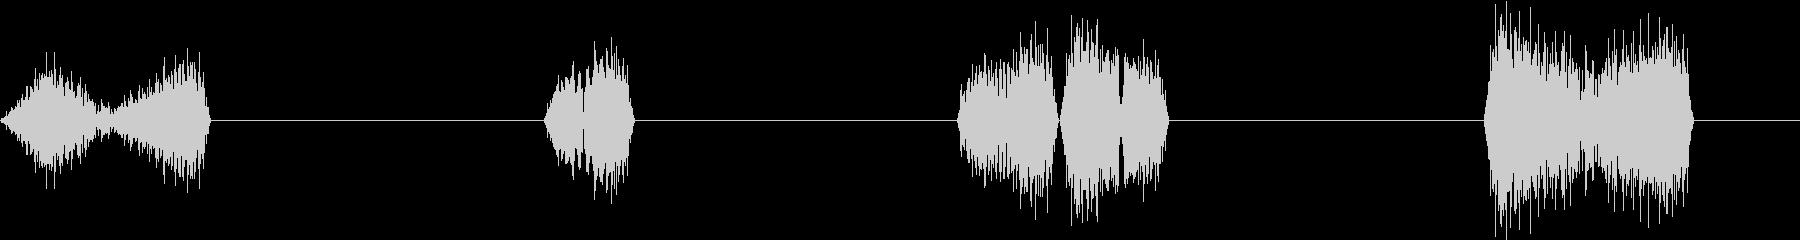 DJプレイ スクラッチ・ノイズ 10の未再生の波形